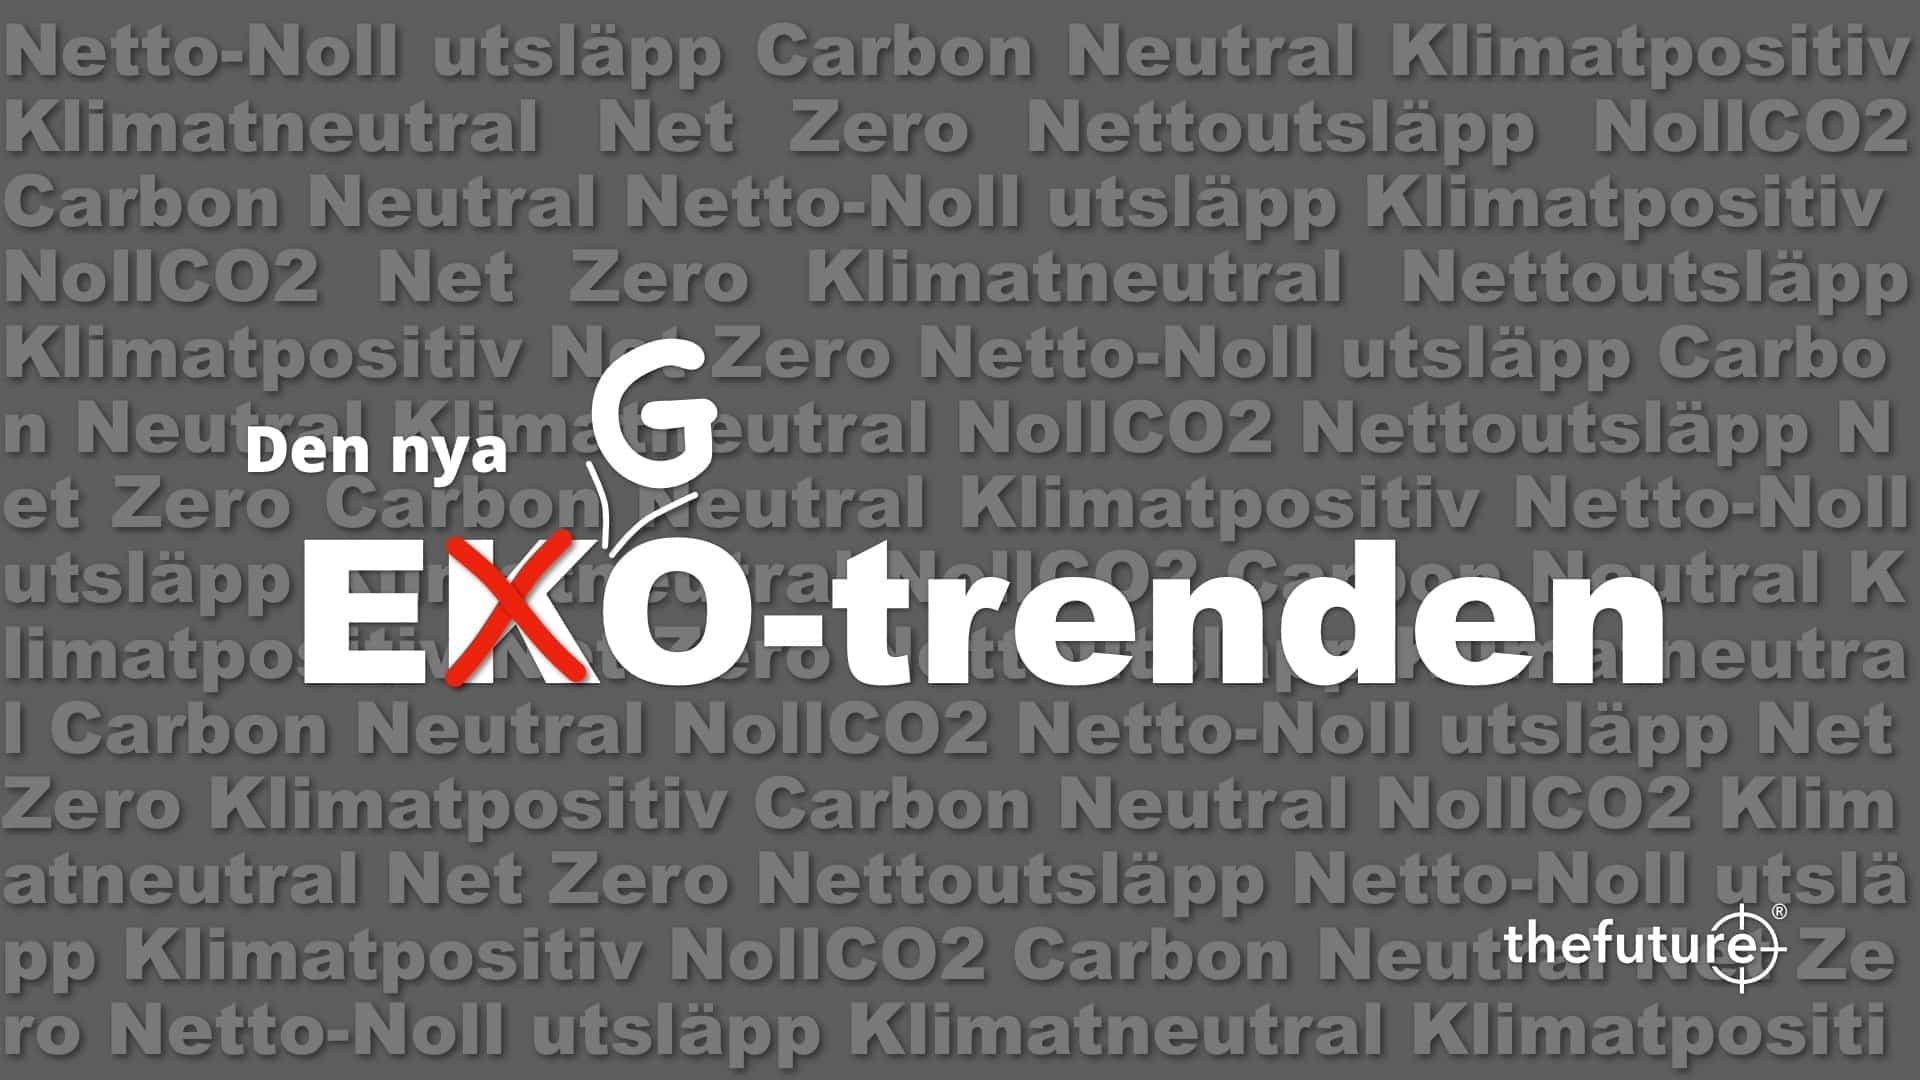 thefuture, blogg, Den-nya-EGO-trenden